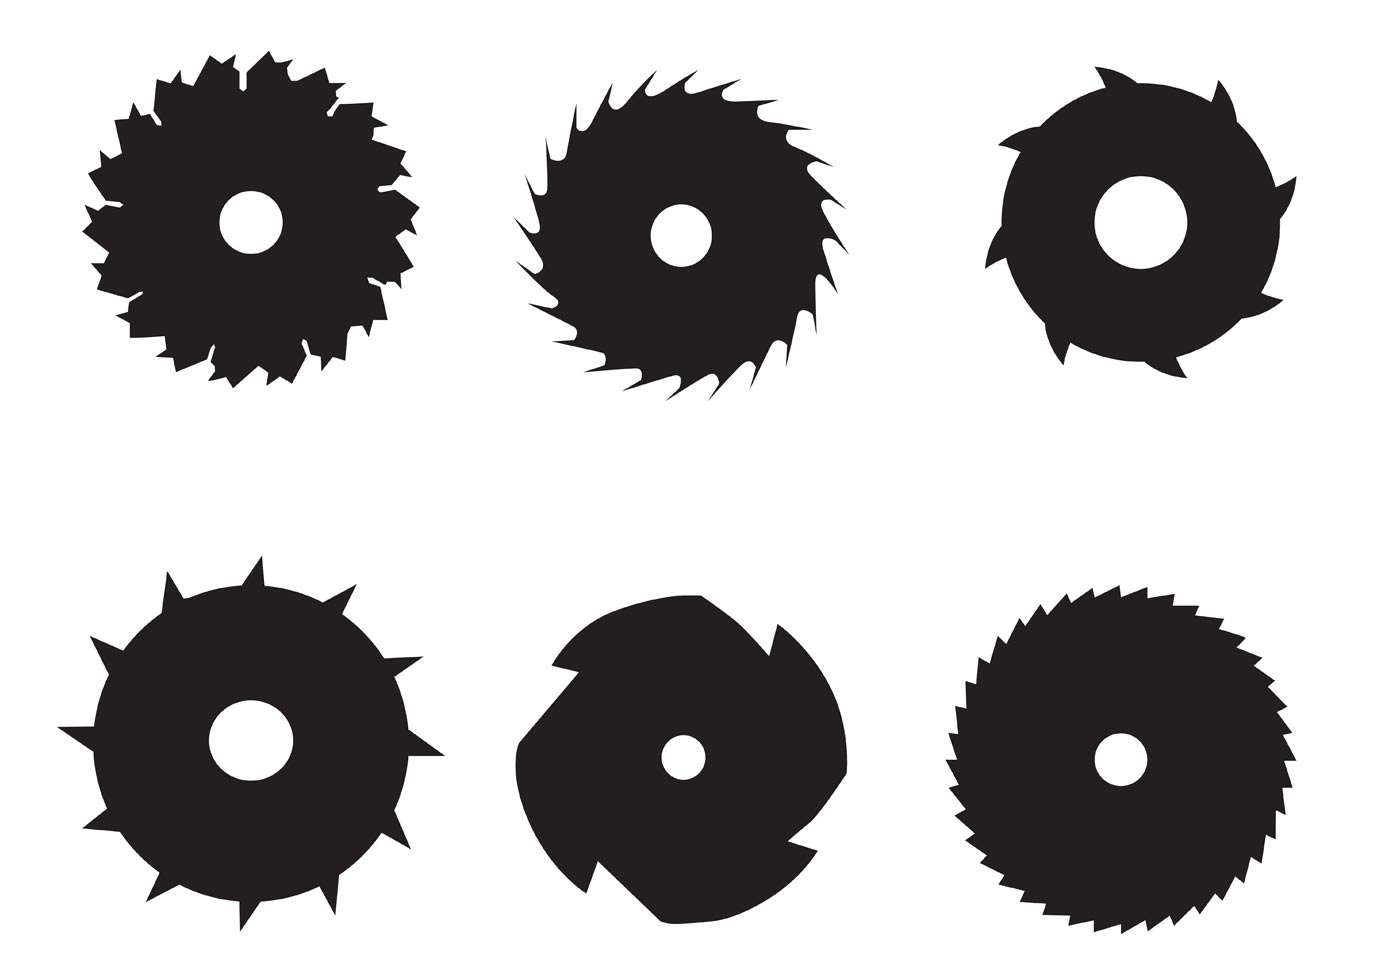 Circular Saw Blade Vectors Download Free Vector Art